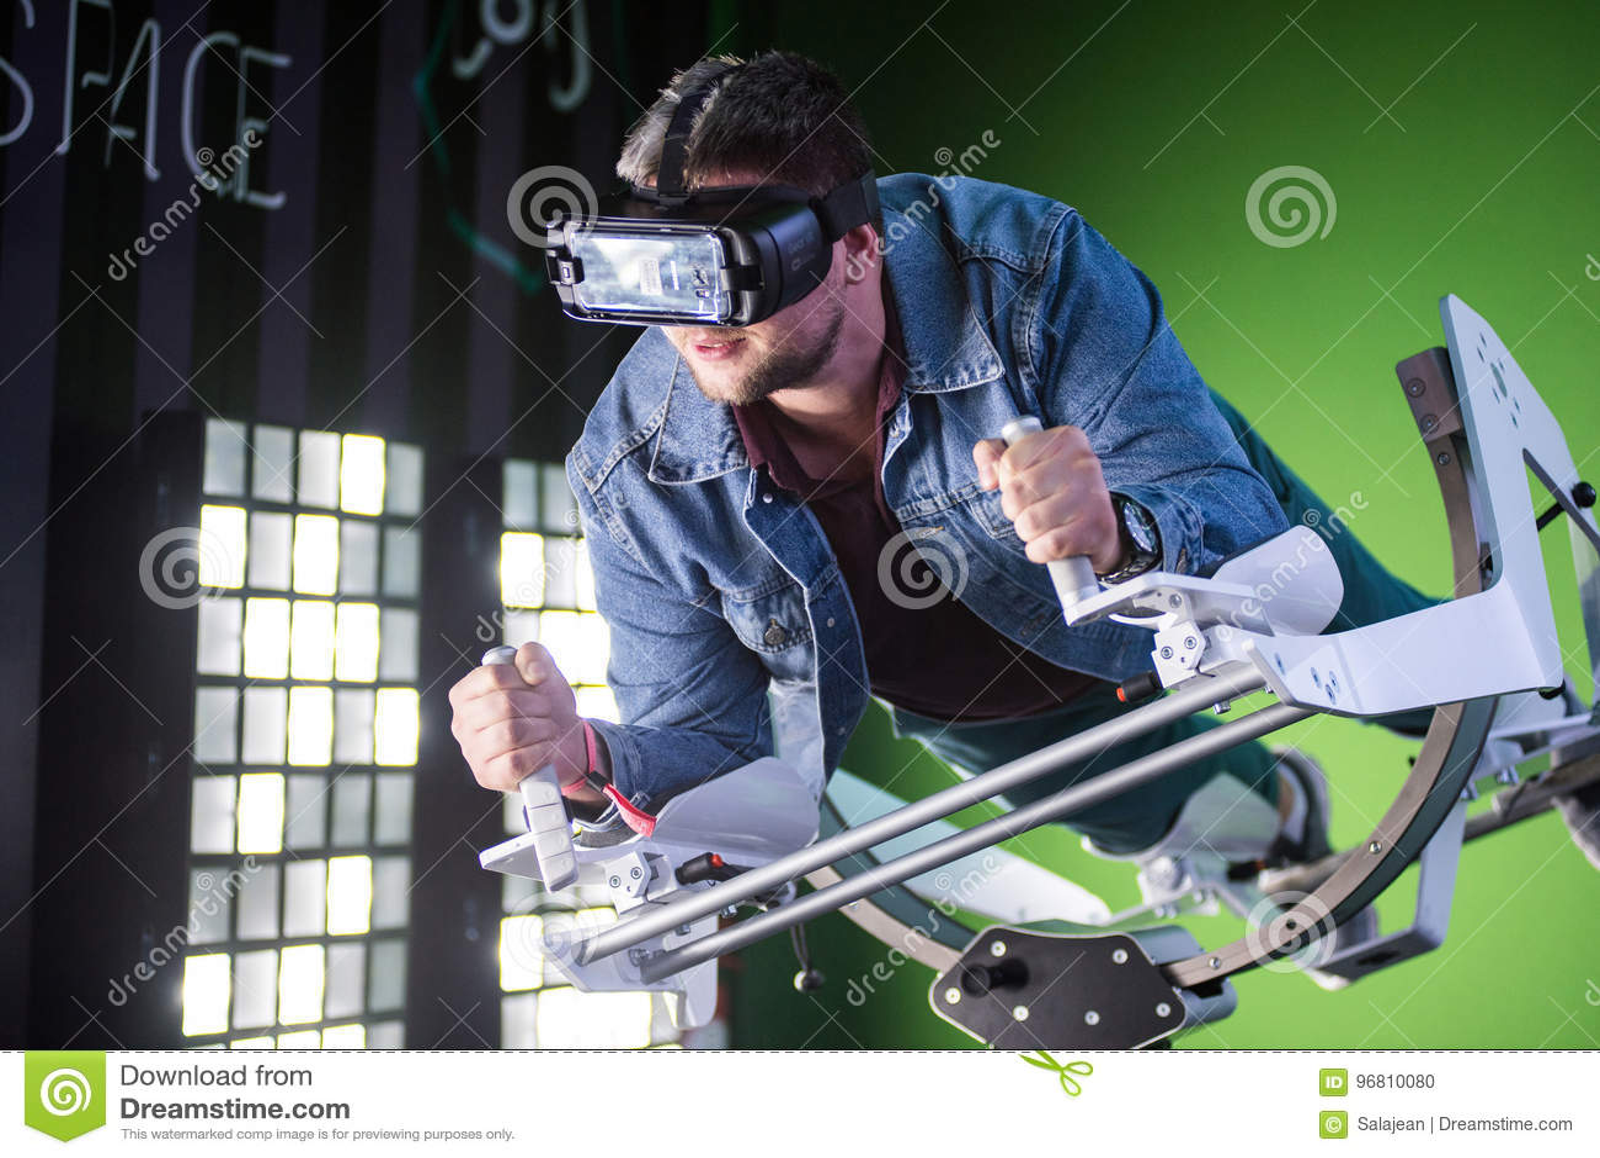 fbd8e620ef2 Guy Using Samsung Virtual Reality Headset